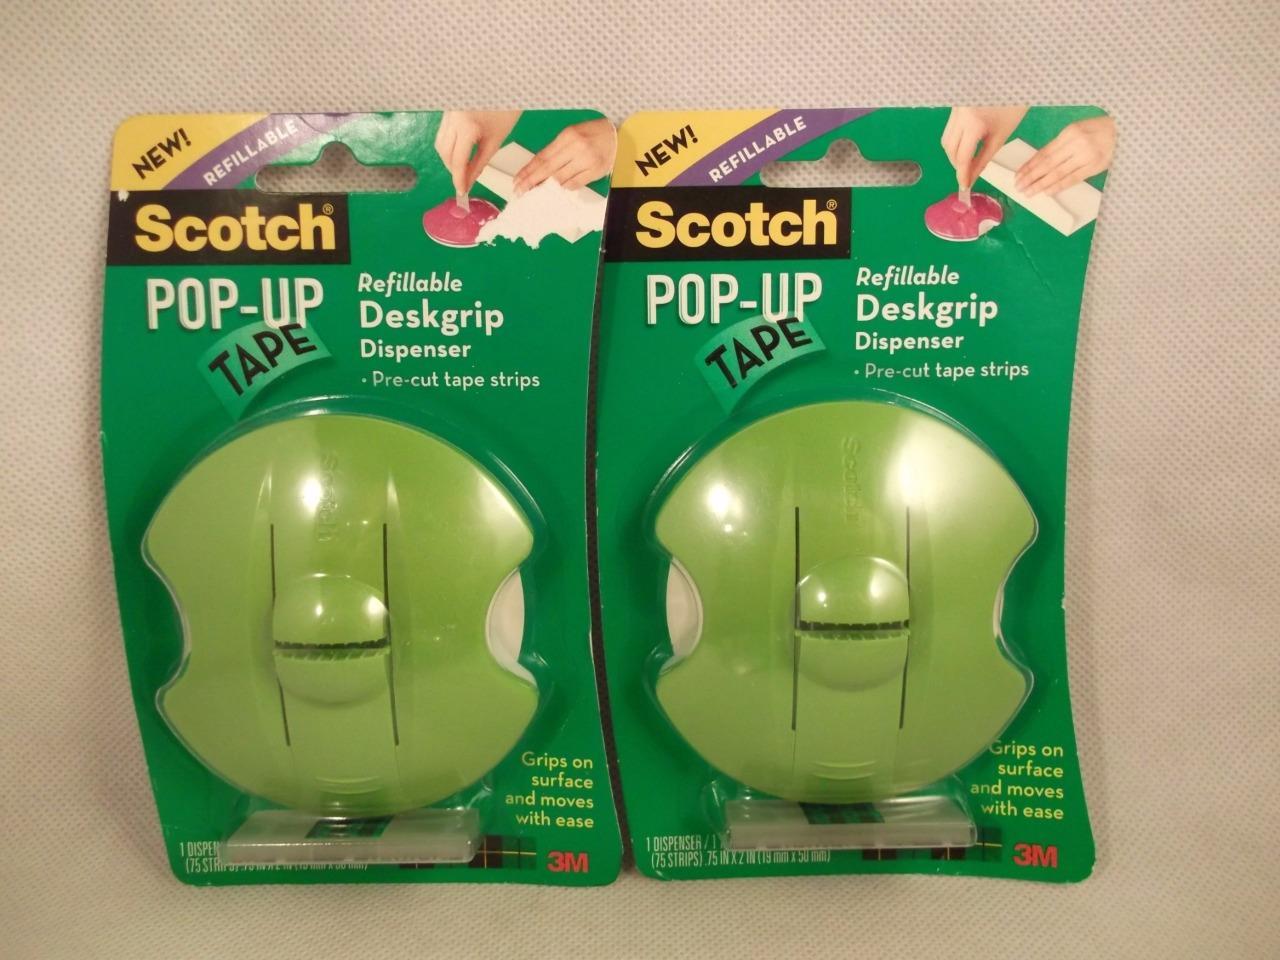 scotch pop up tape dispenser instructions